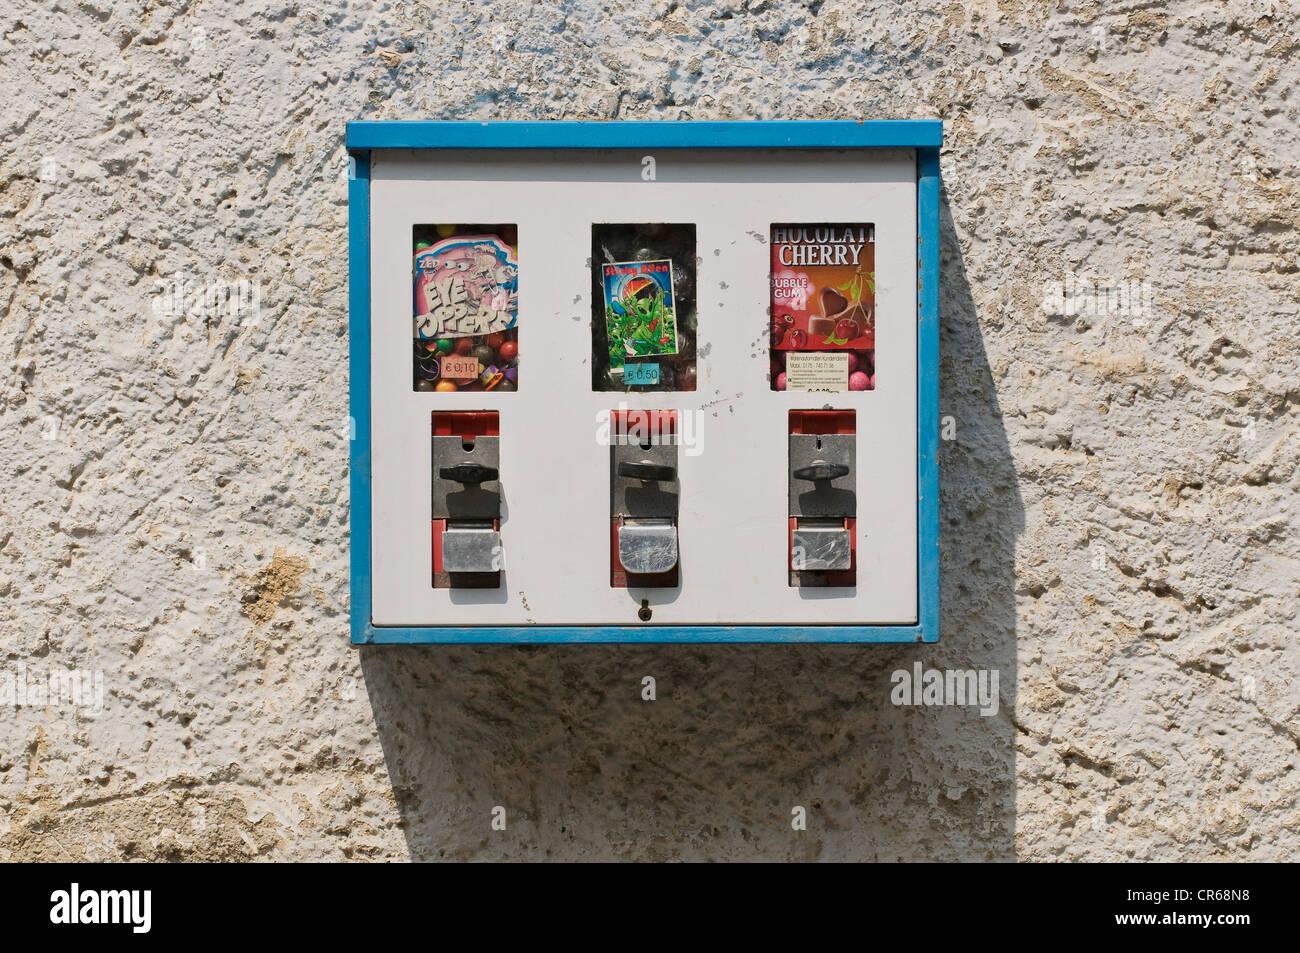 Máquina expendedora de chicles Imagen De Stock